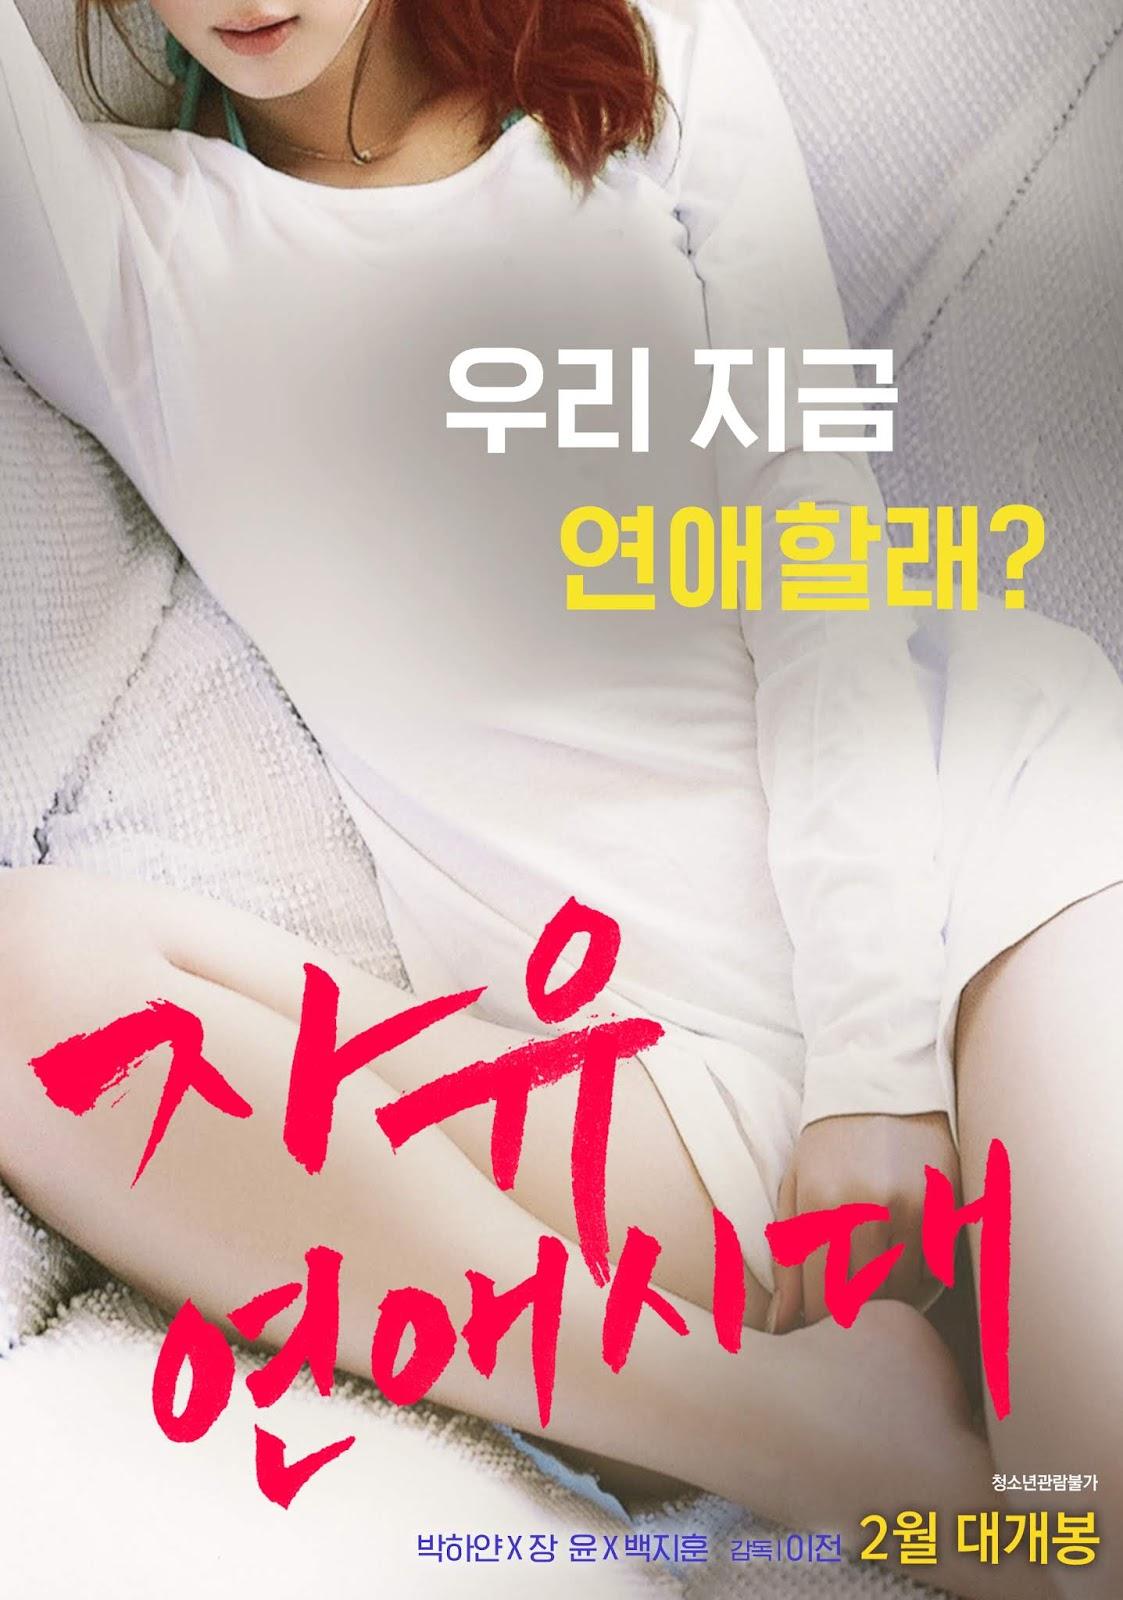 Free Romance Generation Full Korea 18+ Adult Movie Online Free